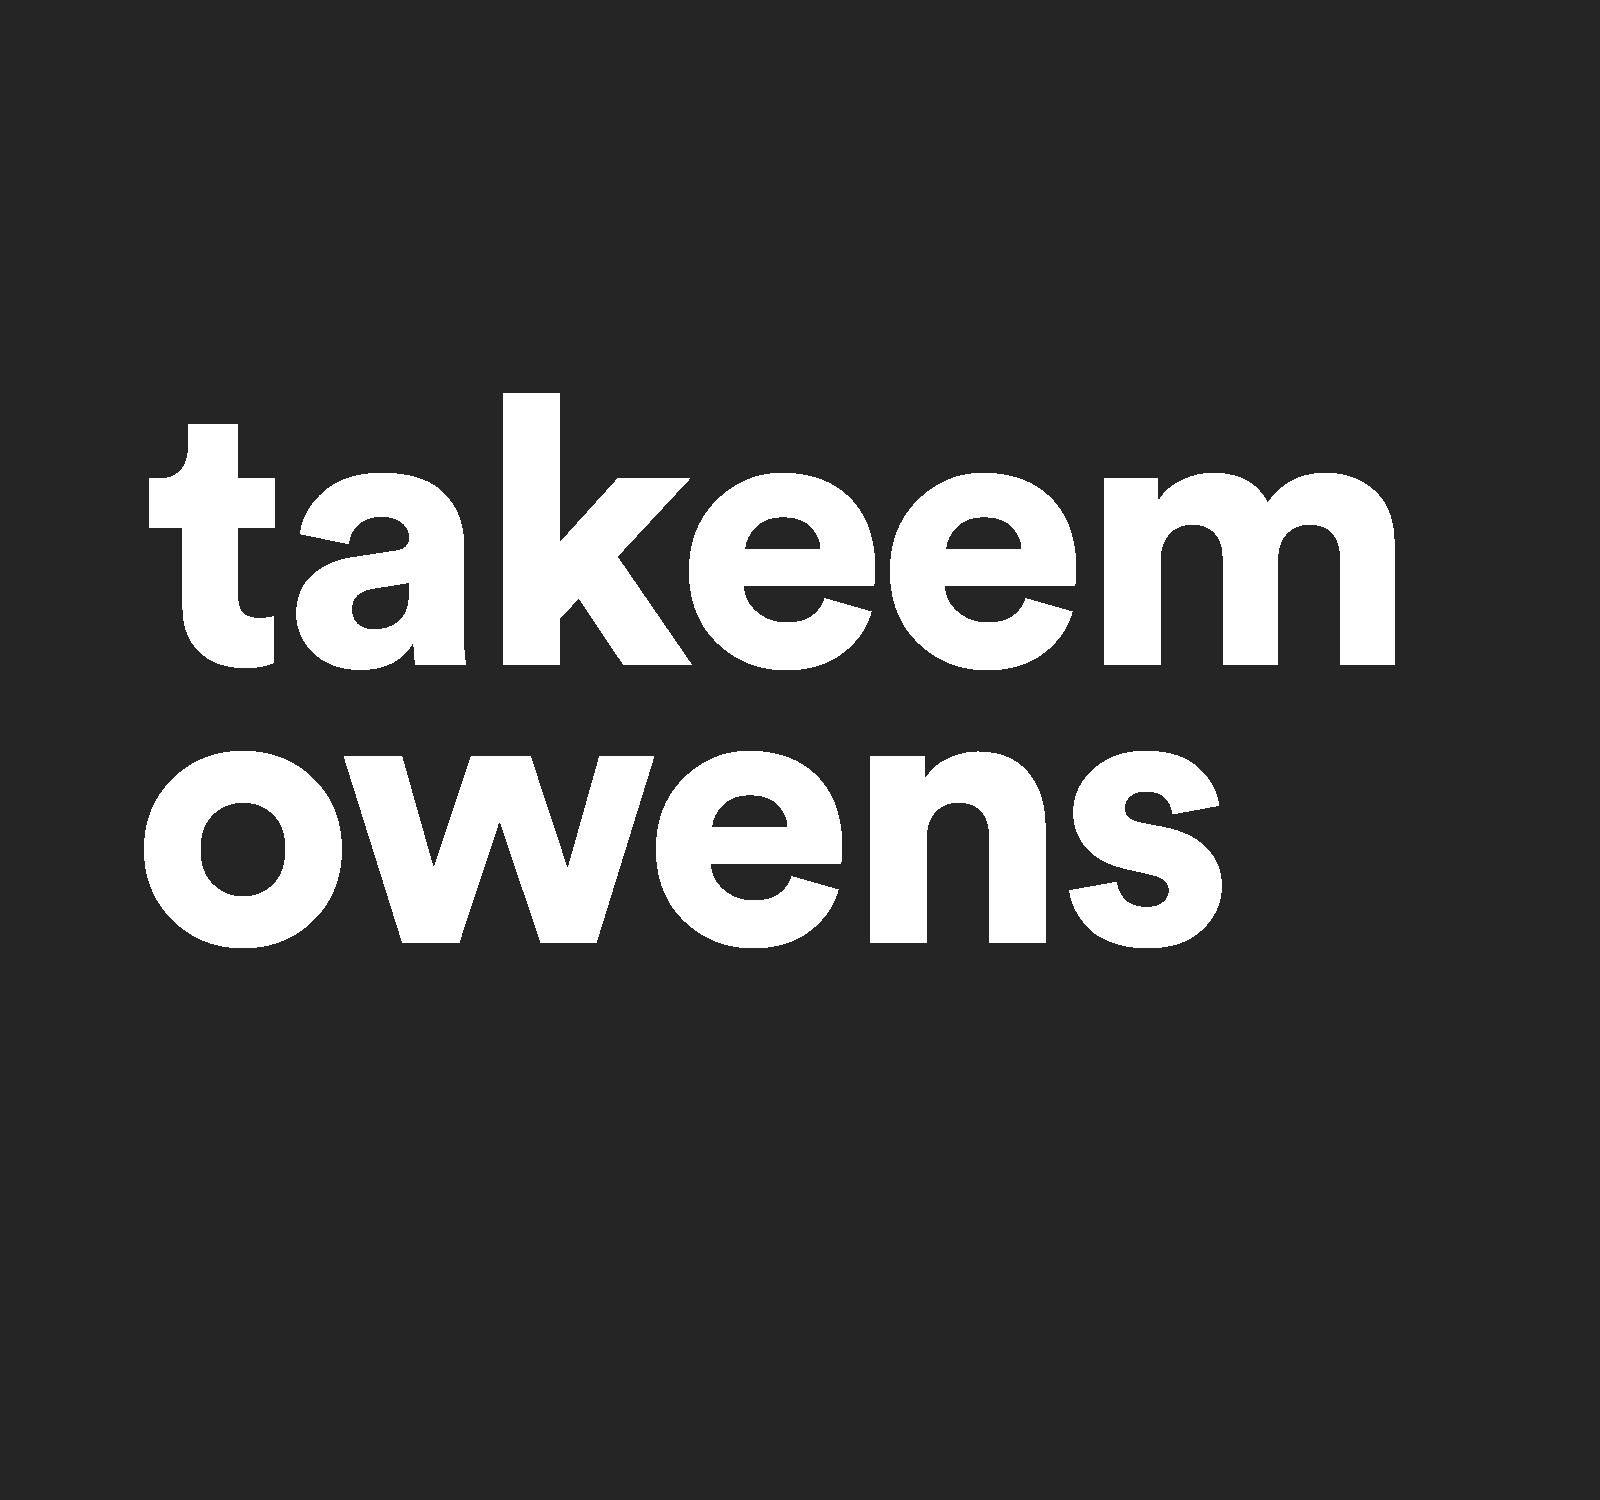 Takeem Owens | Product / UX Design Strategist